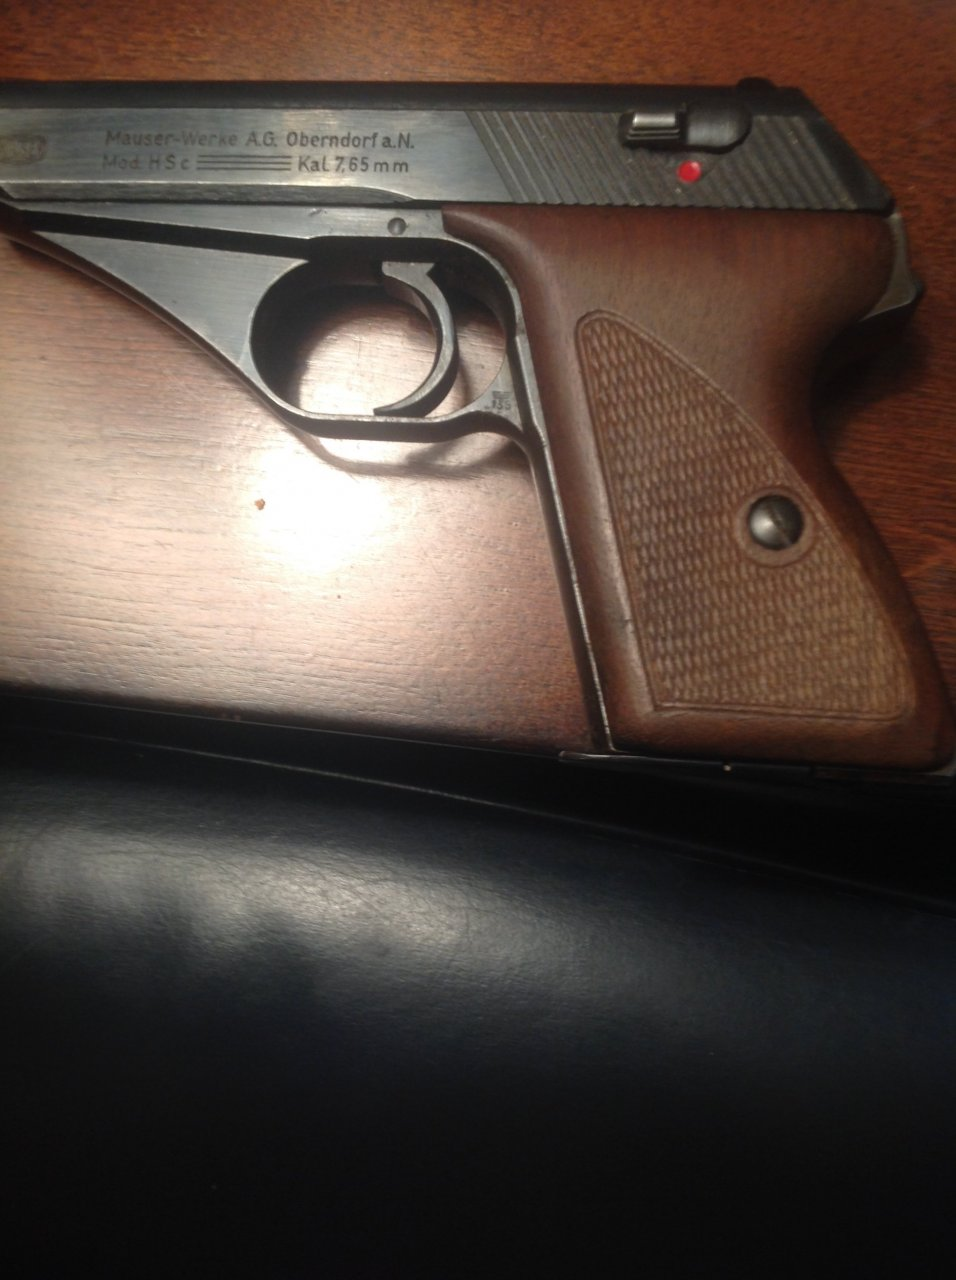 I Have A Mauser-Werke A G Oberndorf A N  Mod HS Kal 7 65 Mm Serial